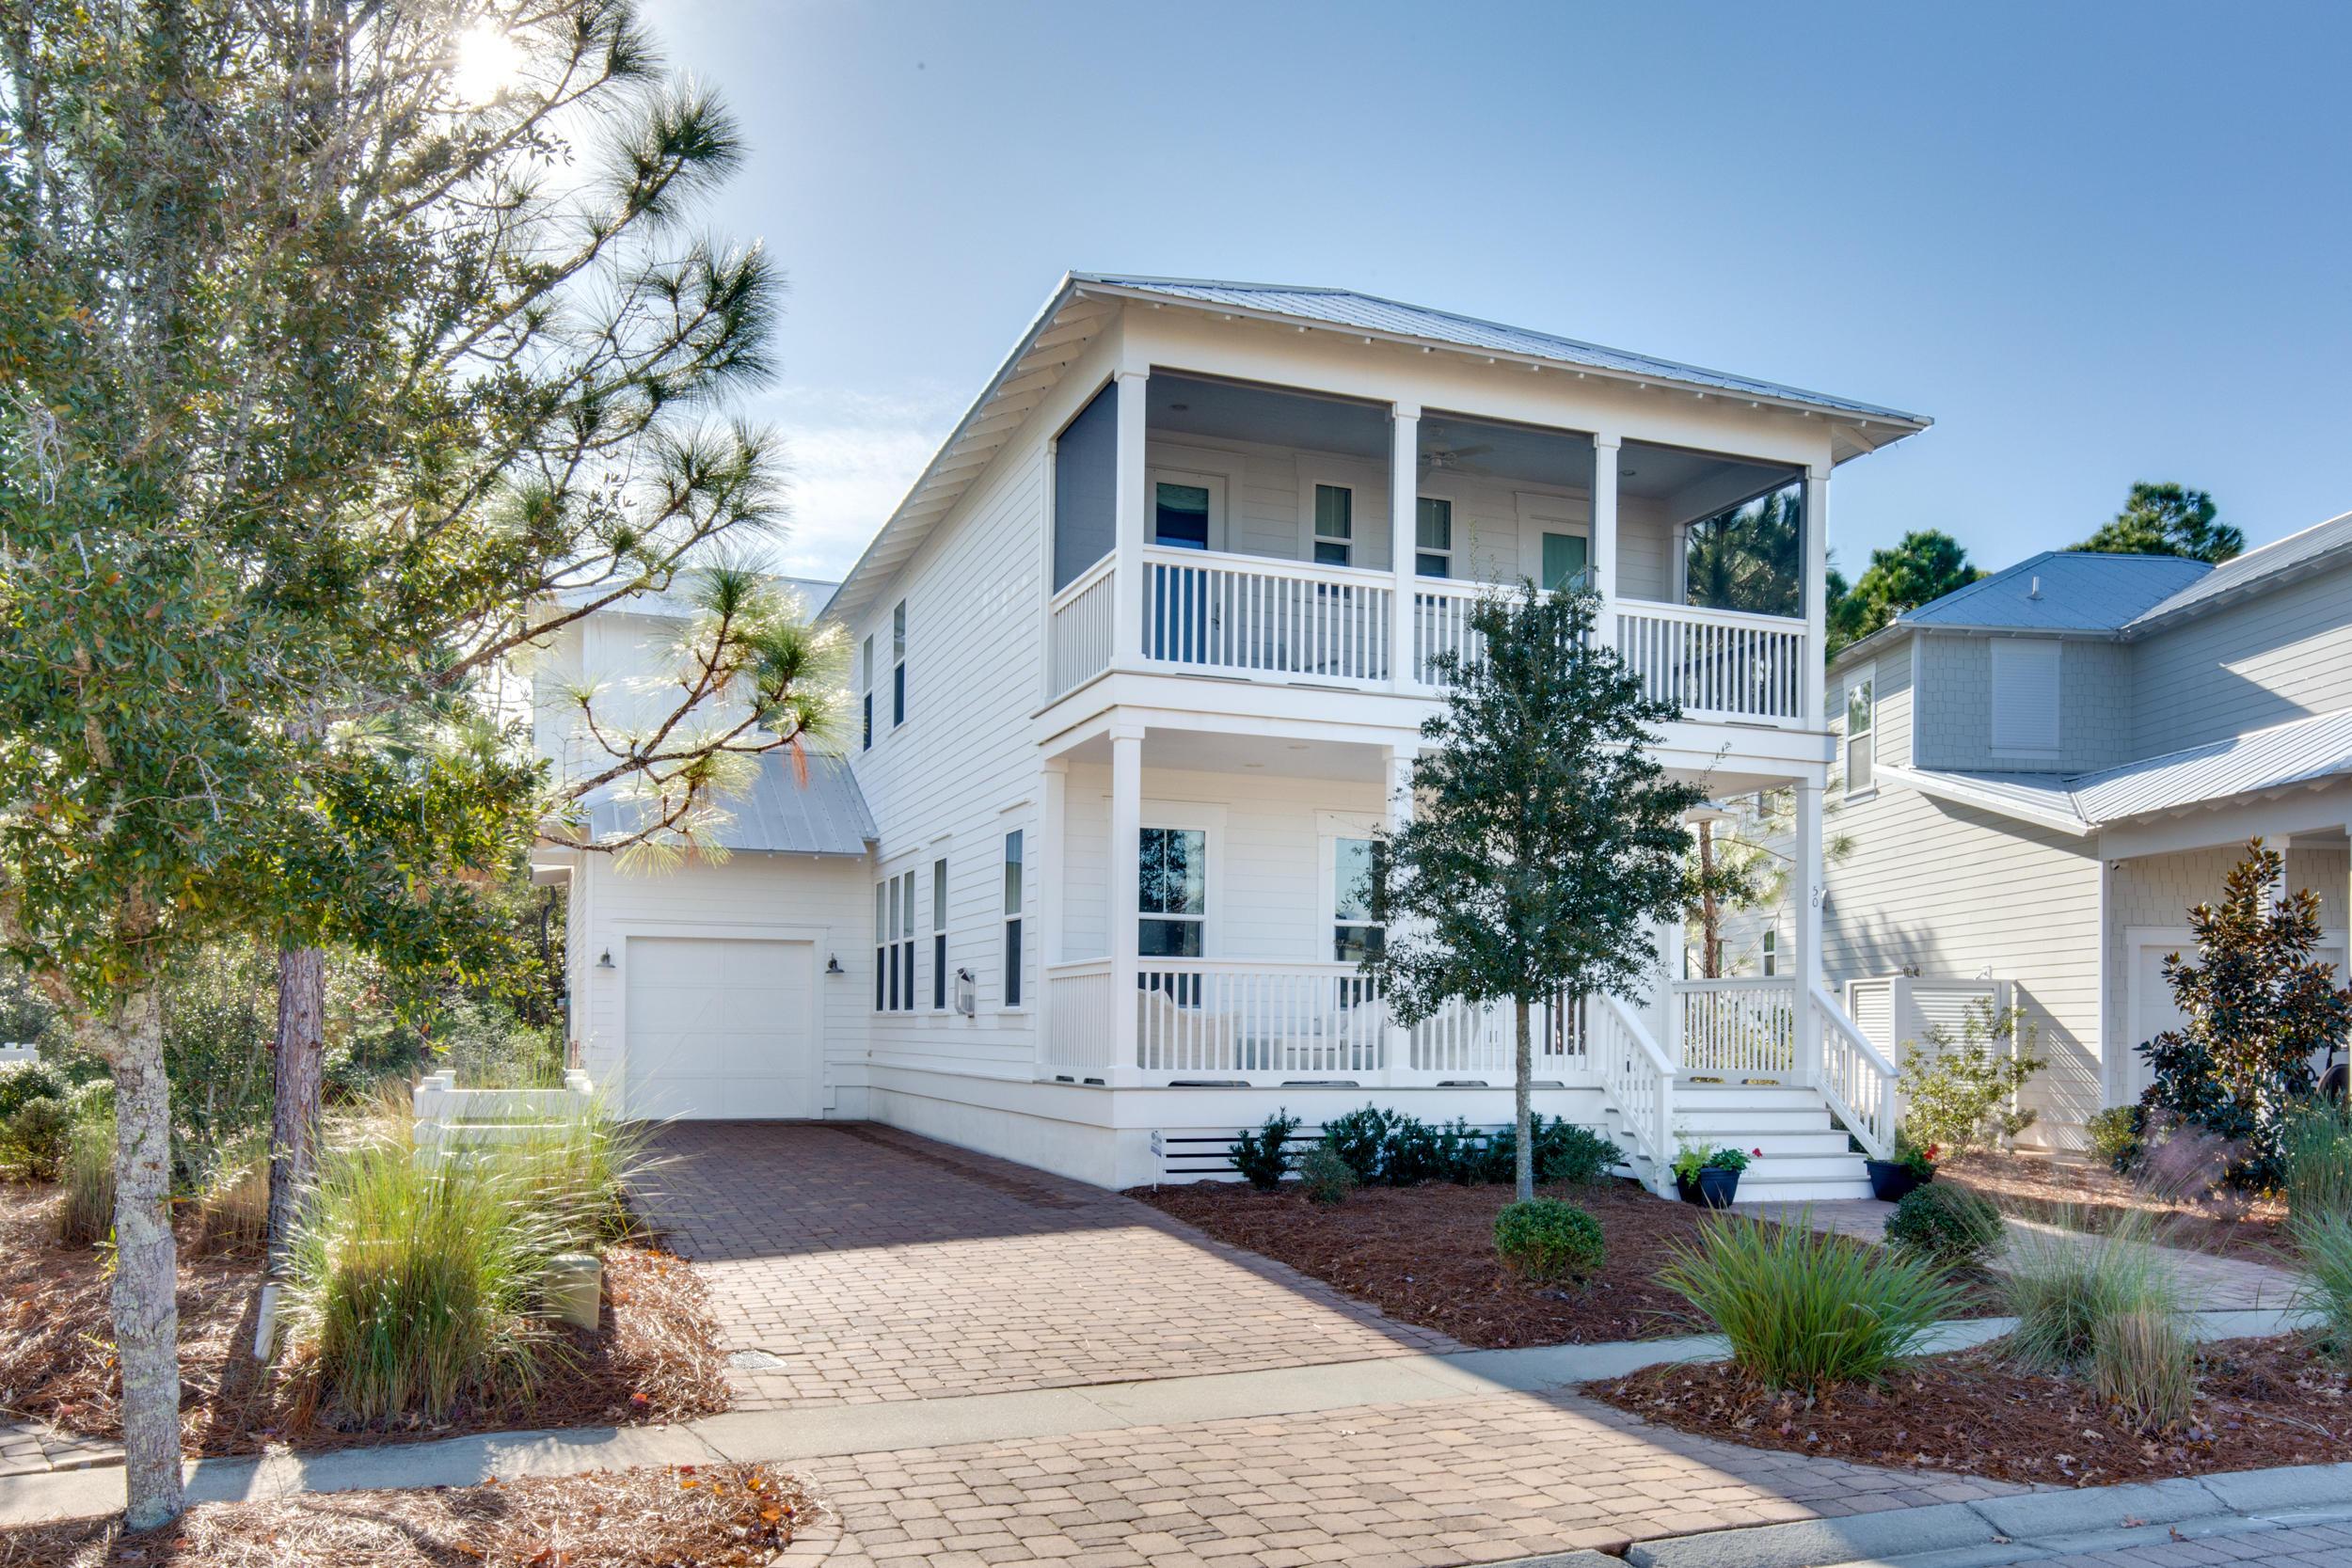 Photo of home for sale at 50 Salamander, Santa Rosa Beach FL